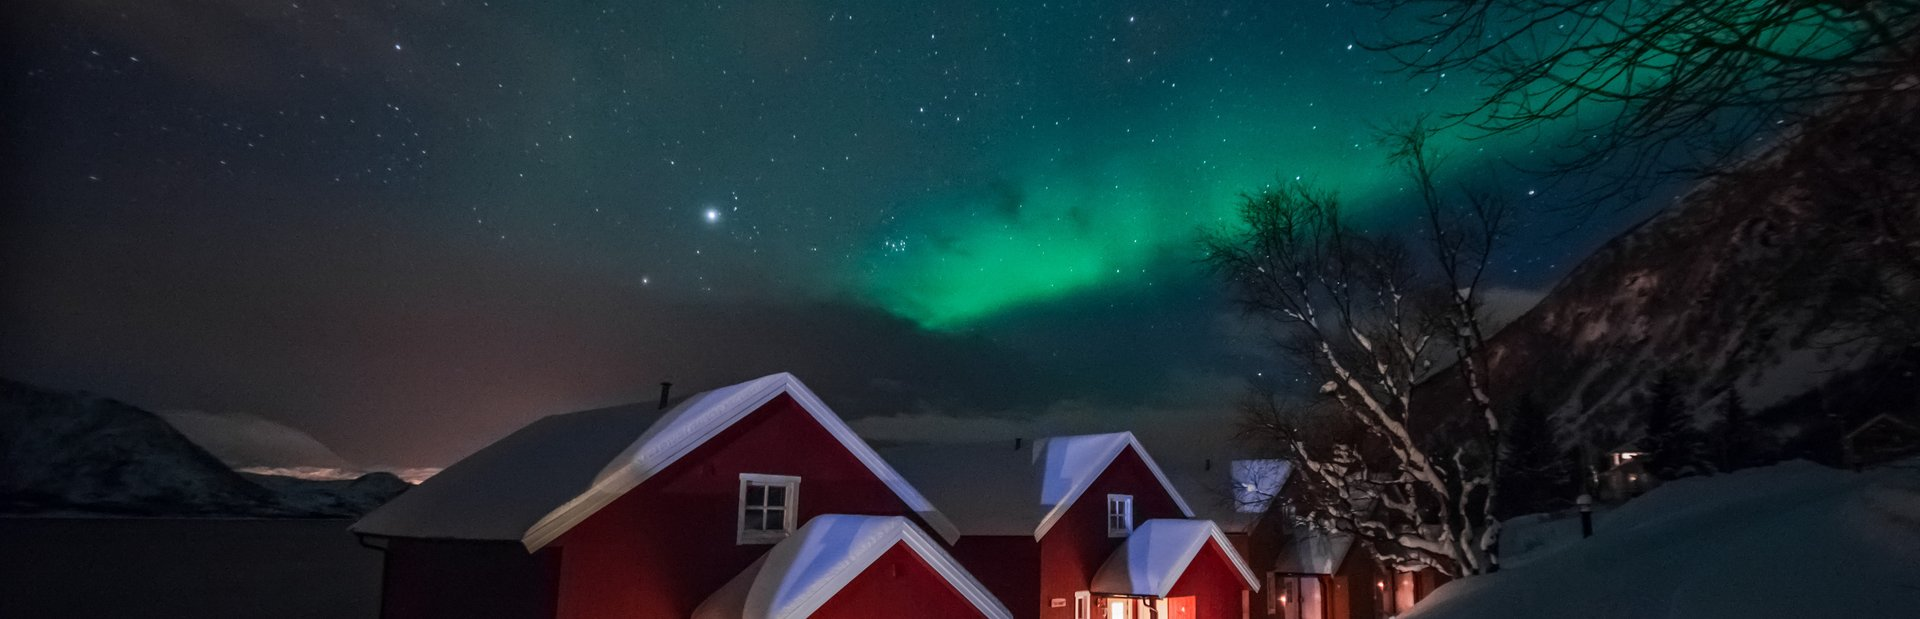 Northern Lights Image 1